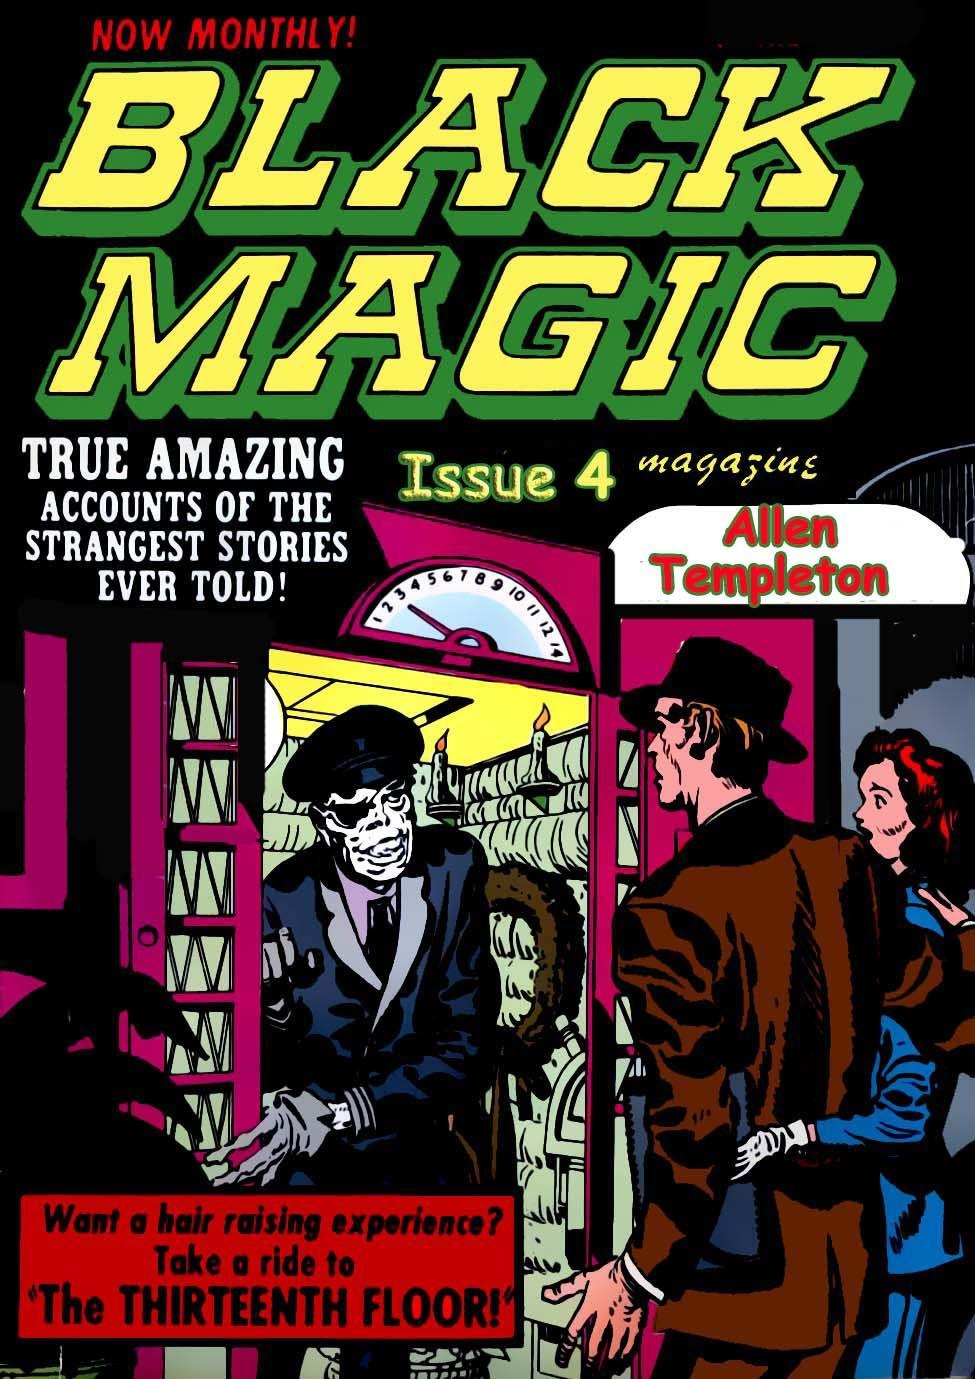 Black Magic Comics Issue 5 Strangest Stories Ever Told Comic Book The Thirteenth Floor From Golden Age Comics Of The 5 Vintage Comic Books Comic Books Comics